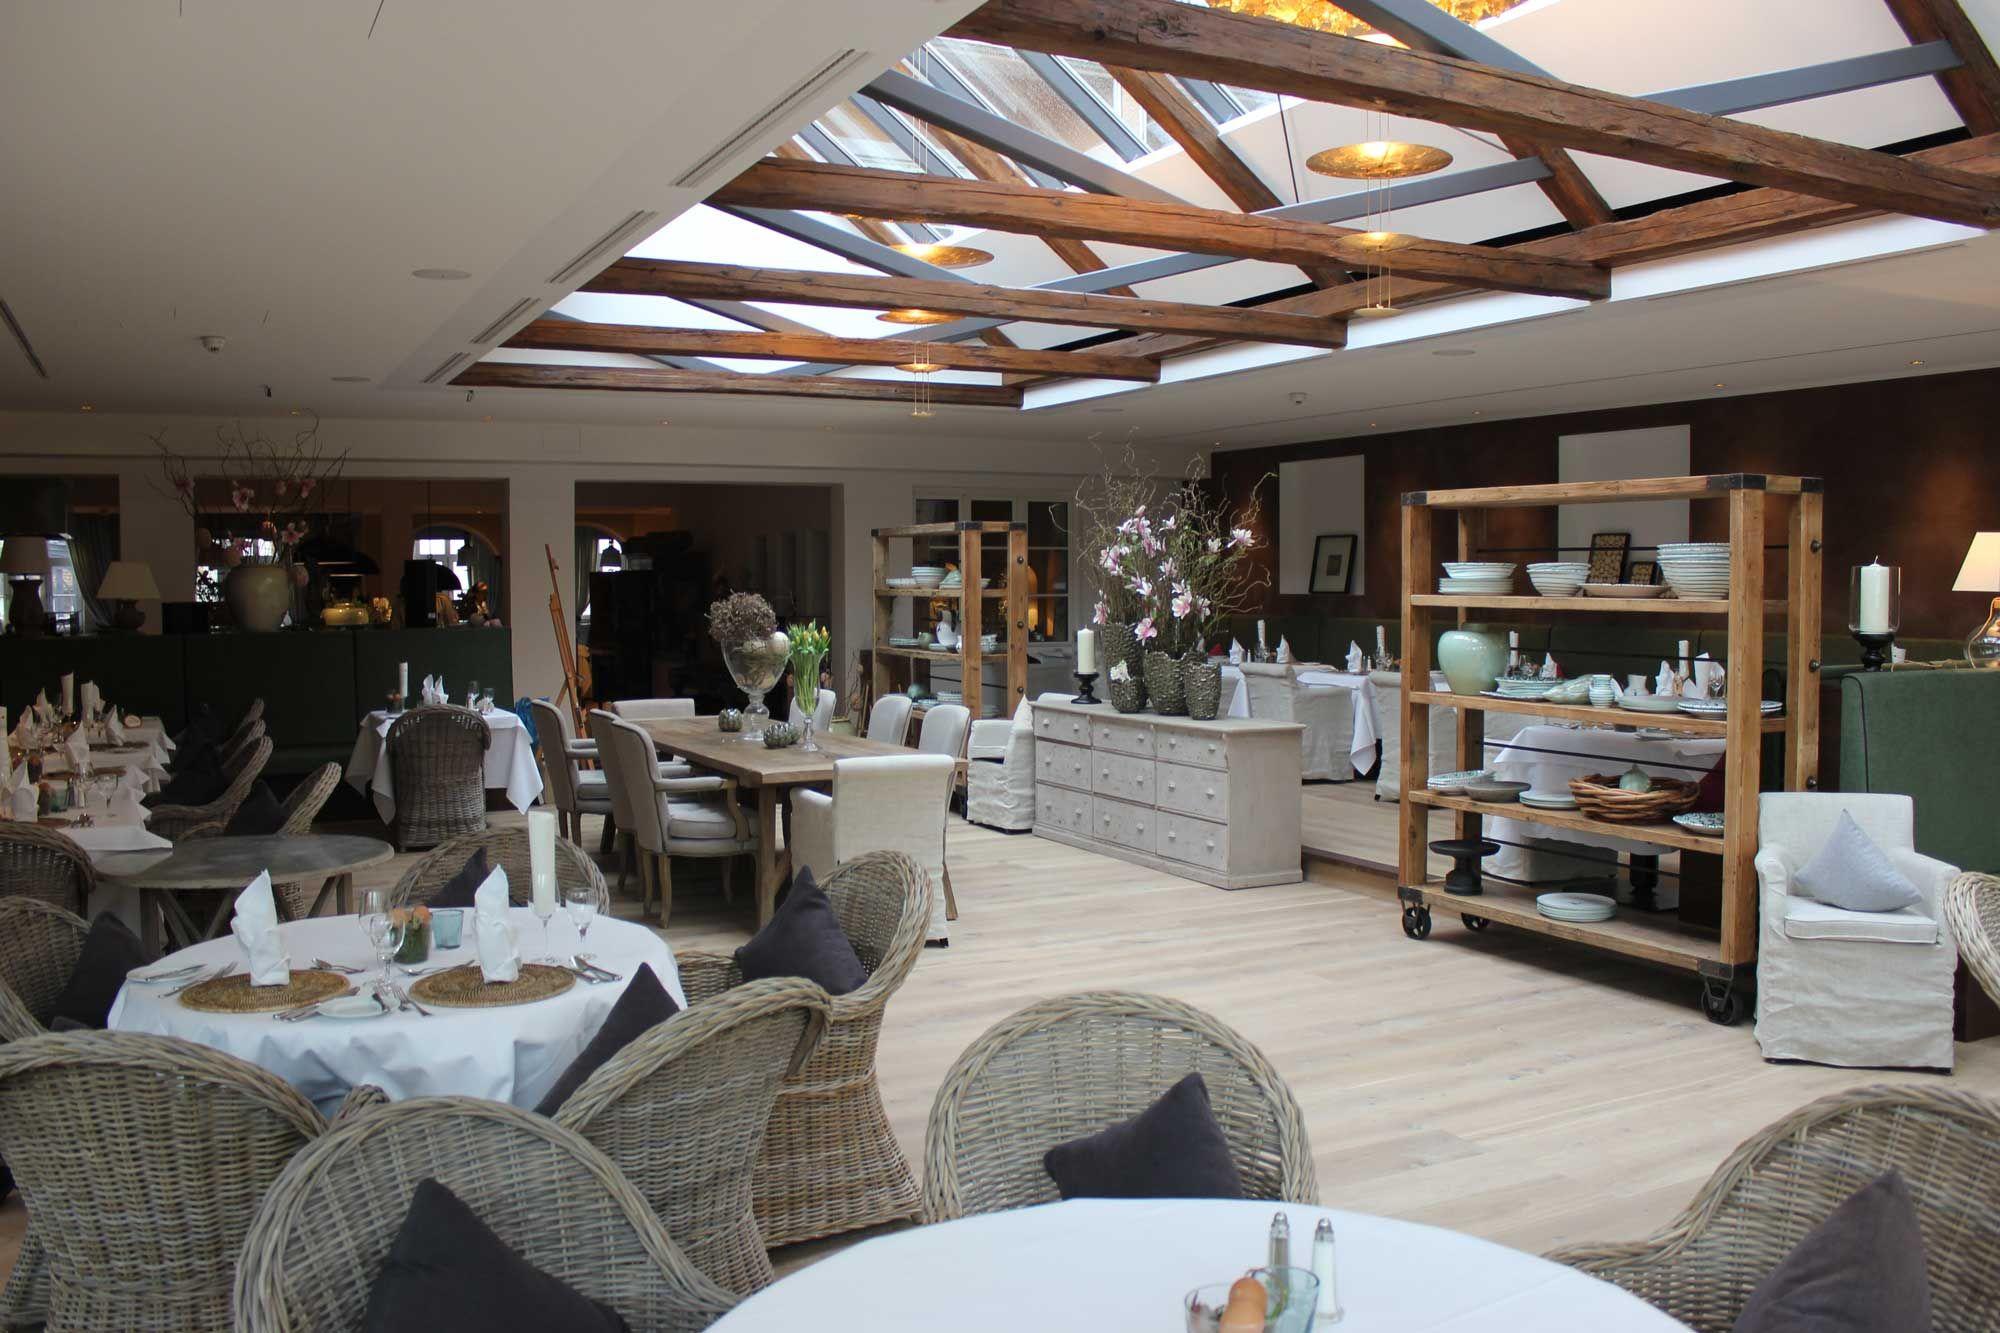 sch nstes hotel und alles perfekt m hlbach thermal spa romantik hotel niederbayern travel. Black Bedroom Furniture Sets. Home Design Ideas